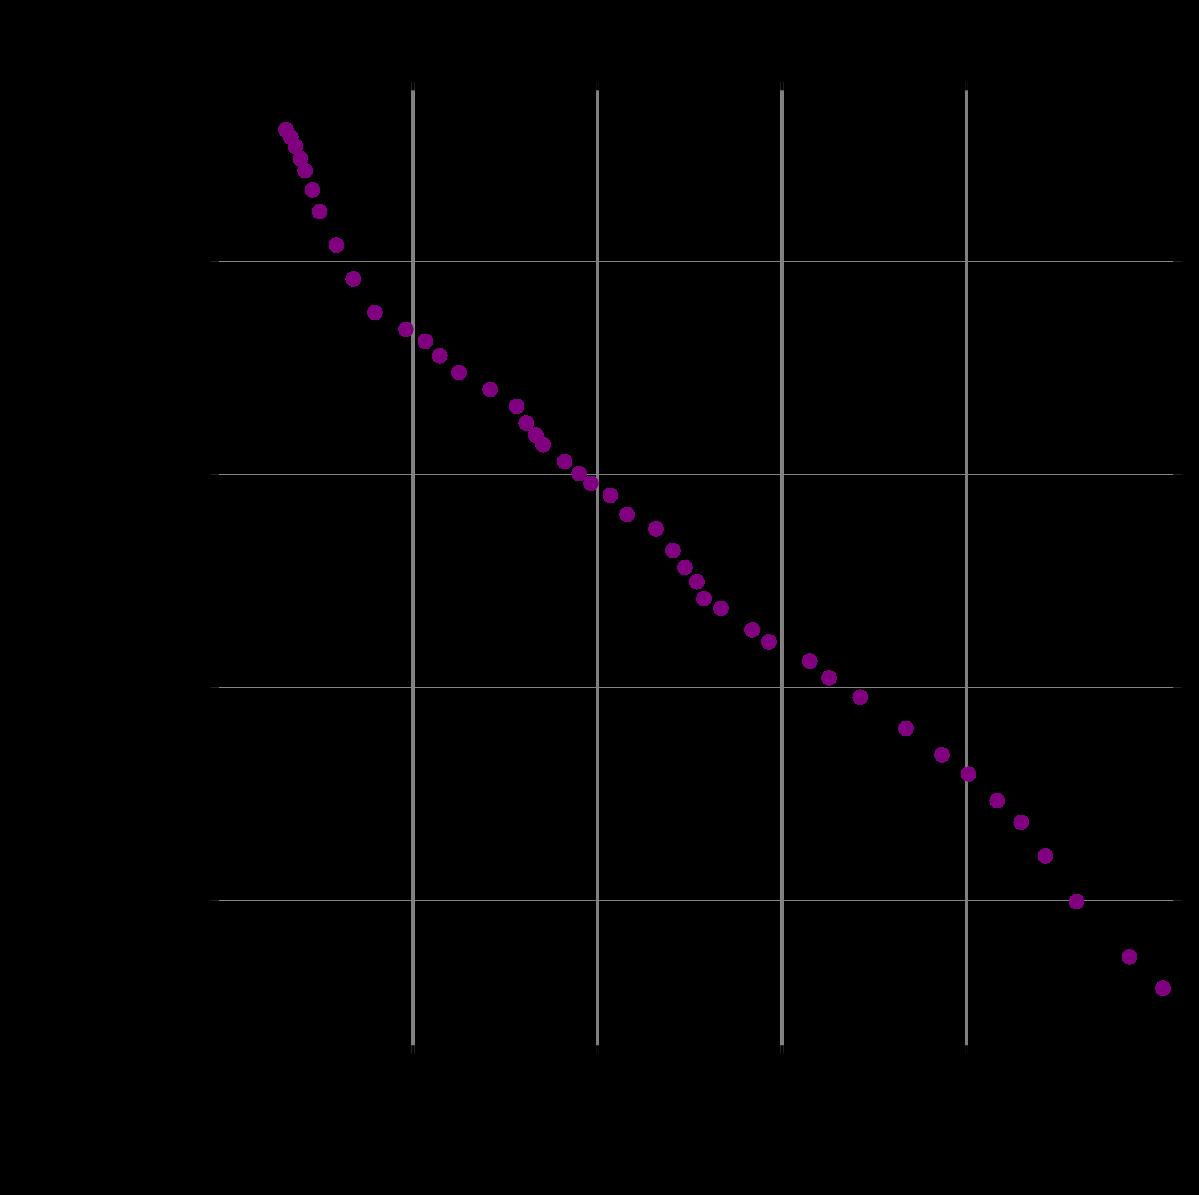 Hr diagram practice problems online brilliant hr diagram pooptronica Choice Image